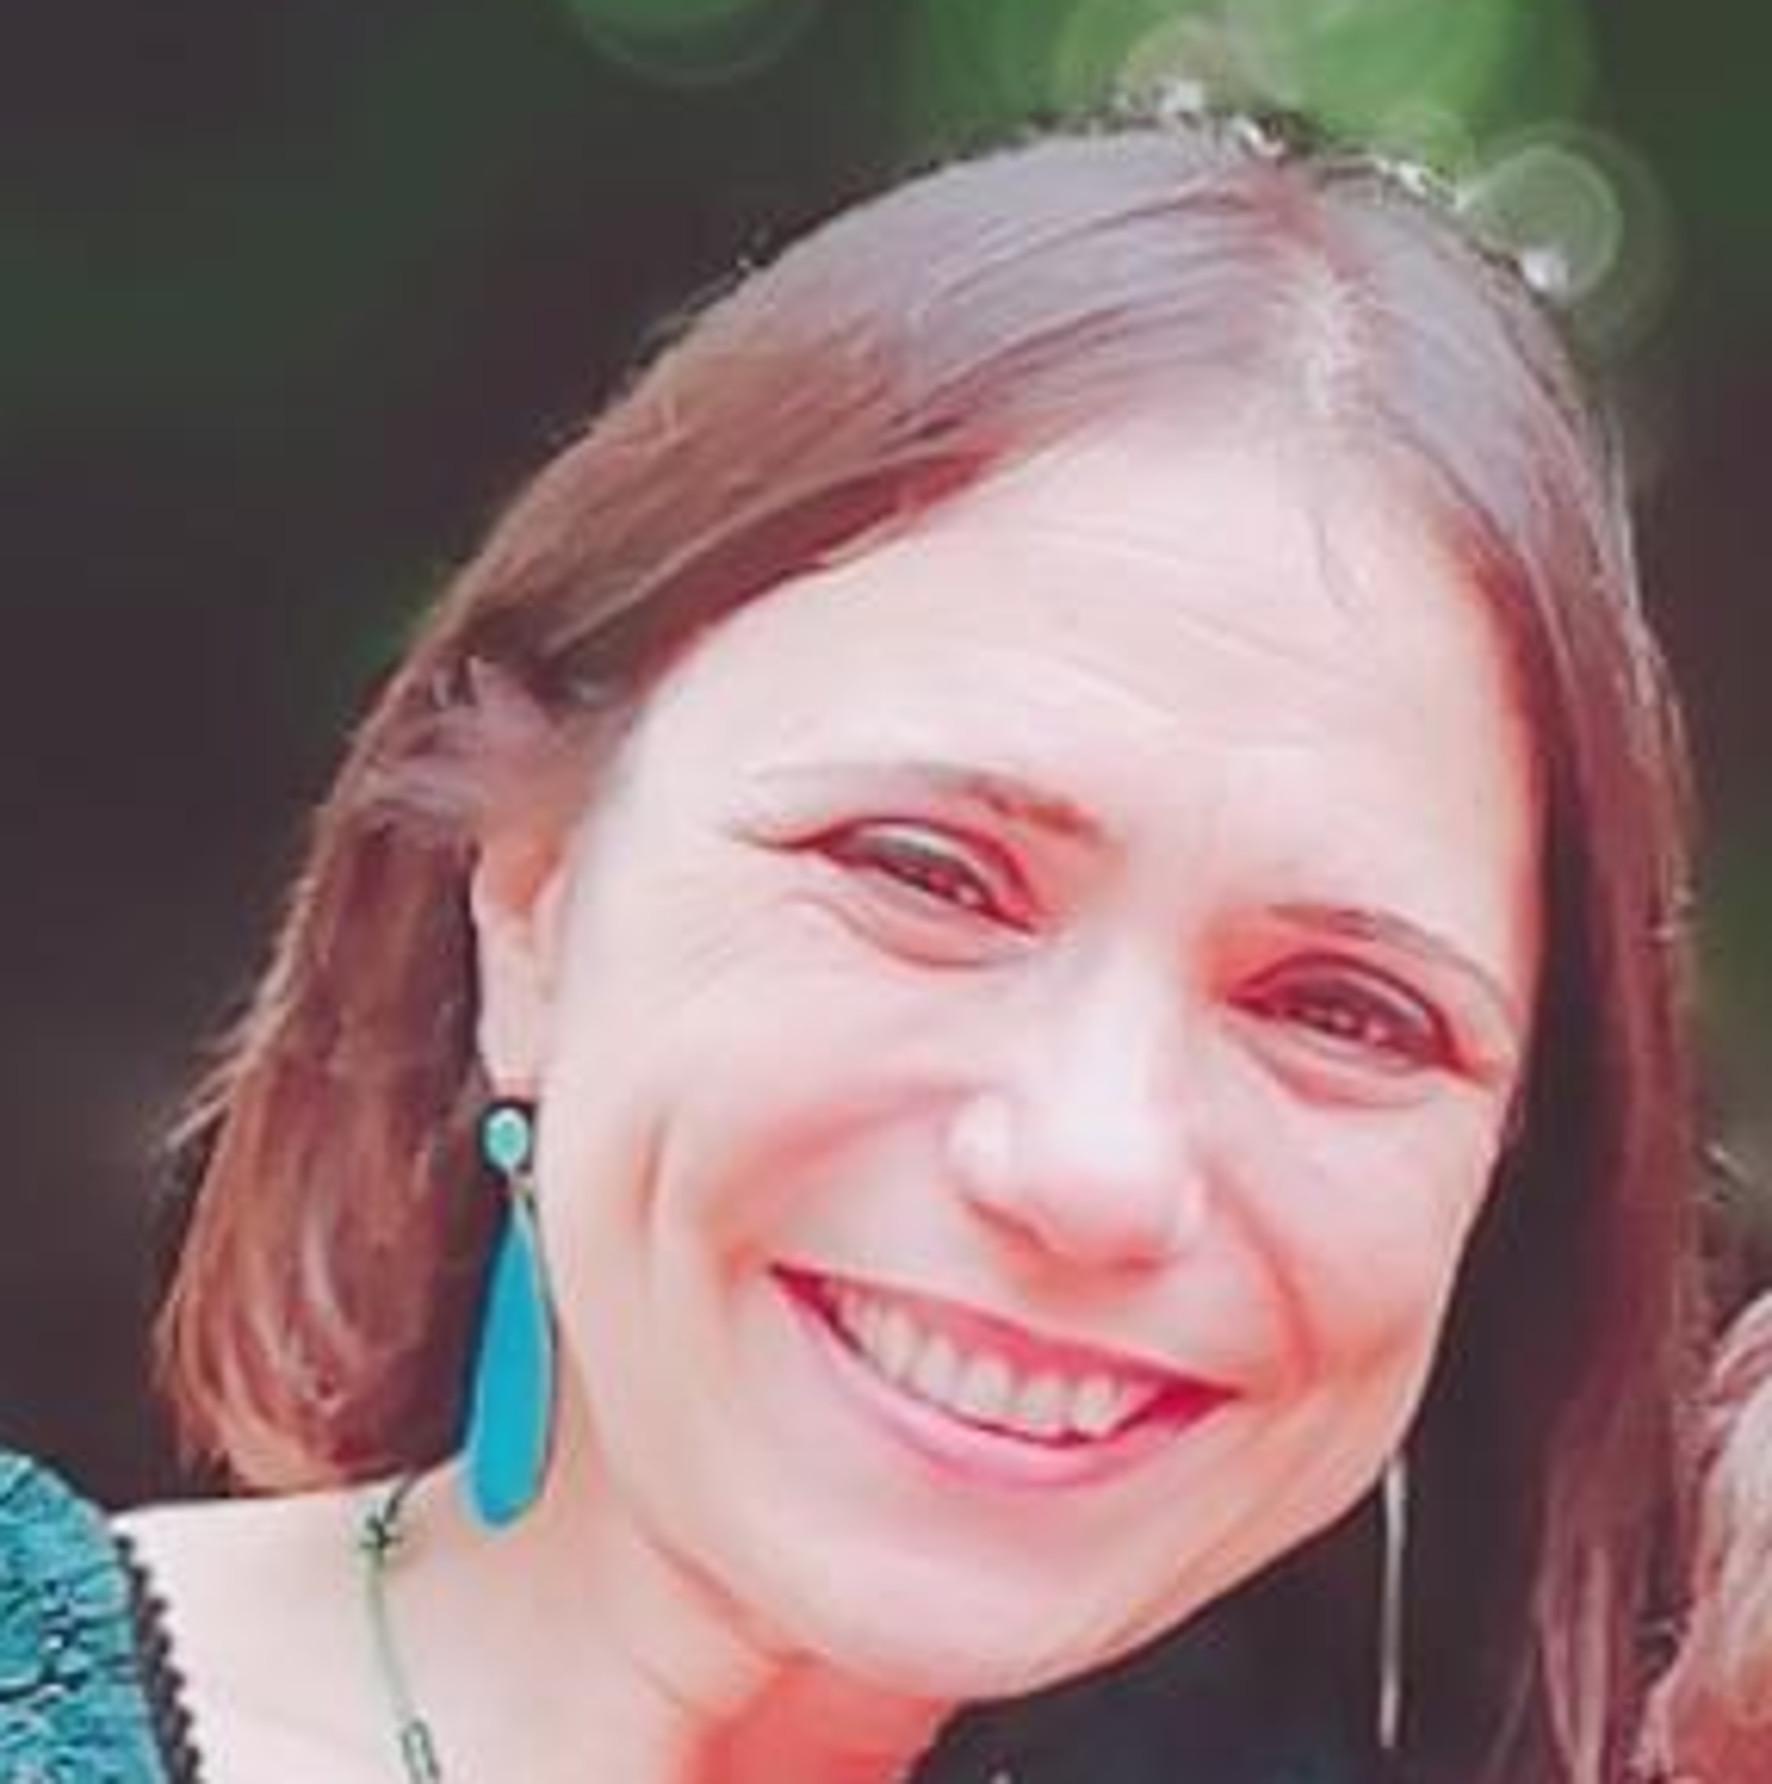 Paola Storari